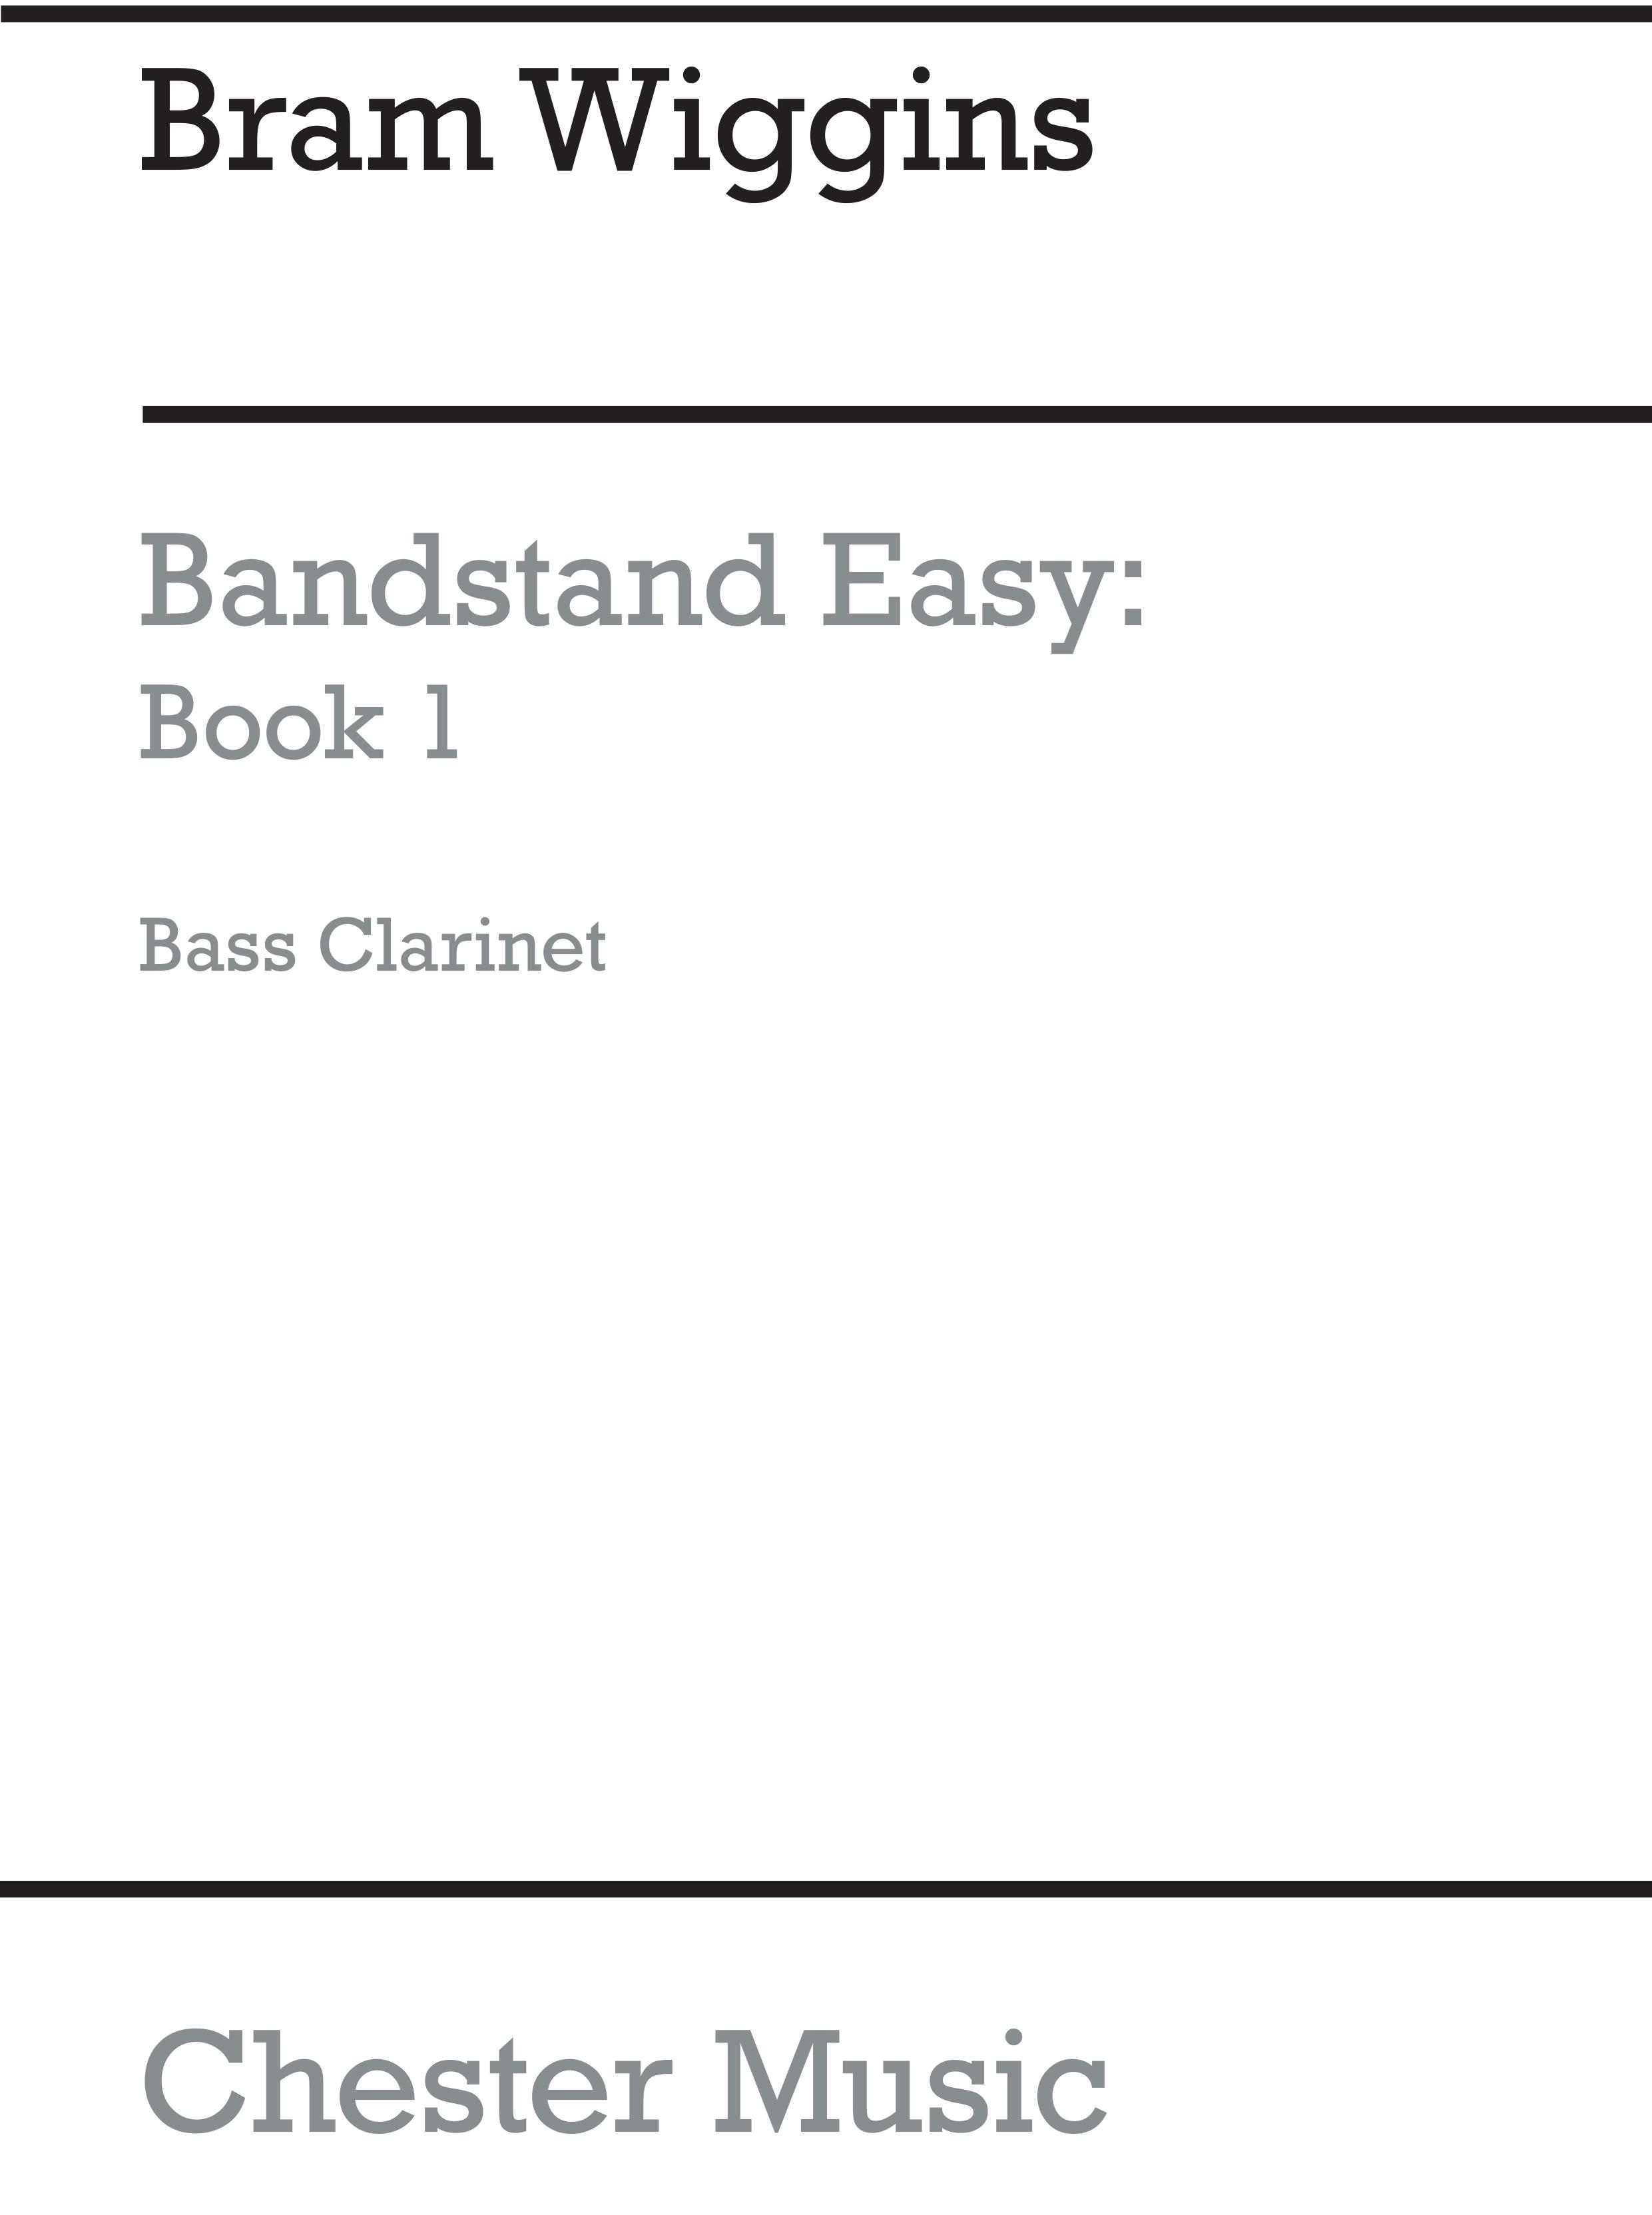 Bram Wiggins: Bandstand Easy Book 1 (Bass Clarinet): Concert Band: Part